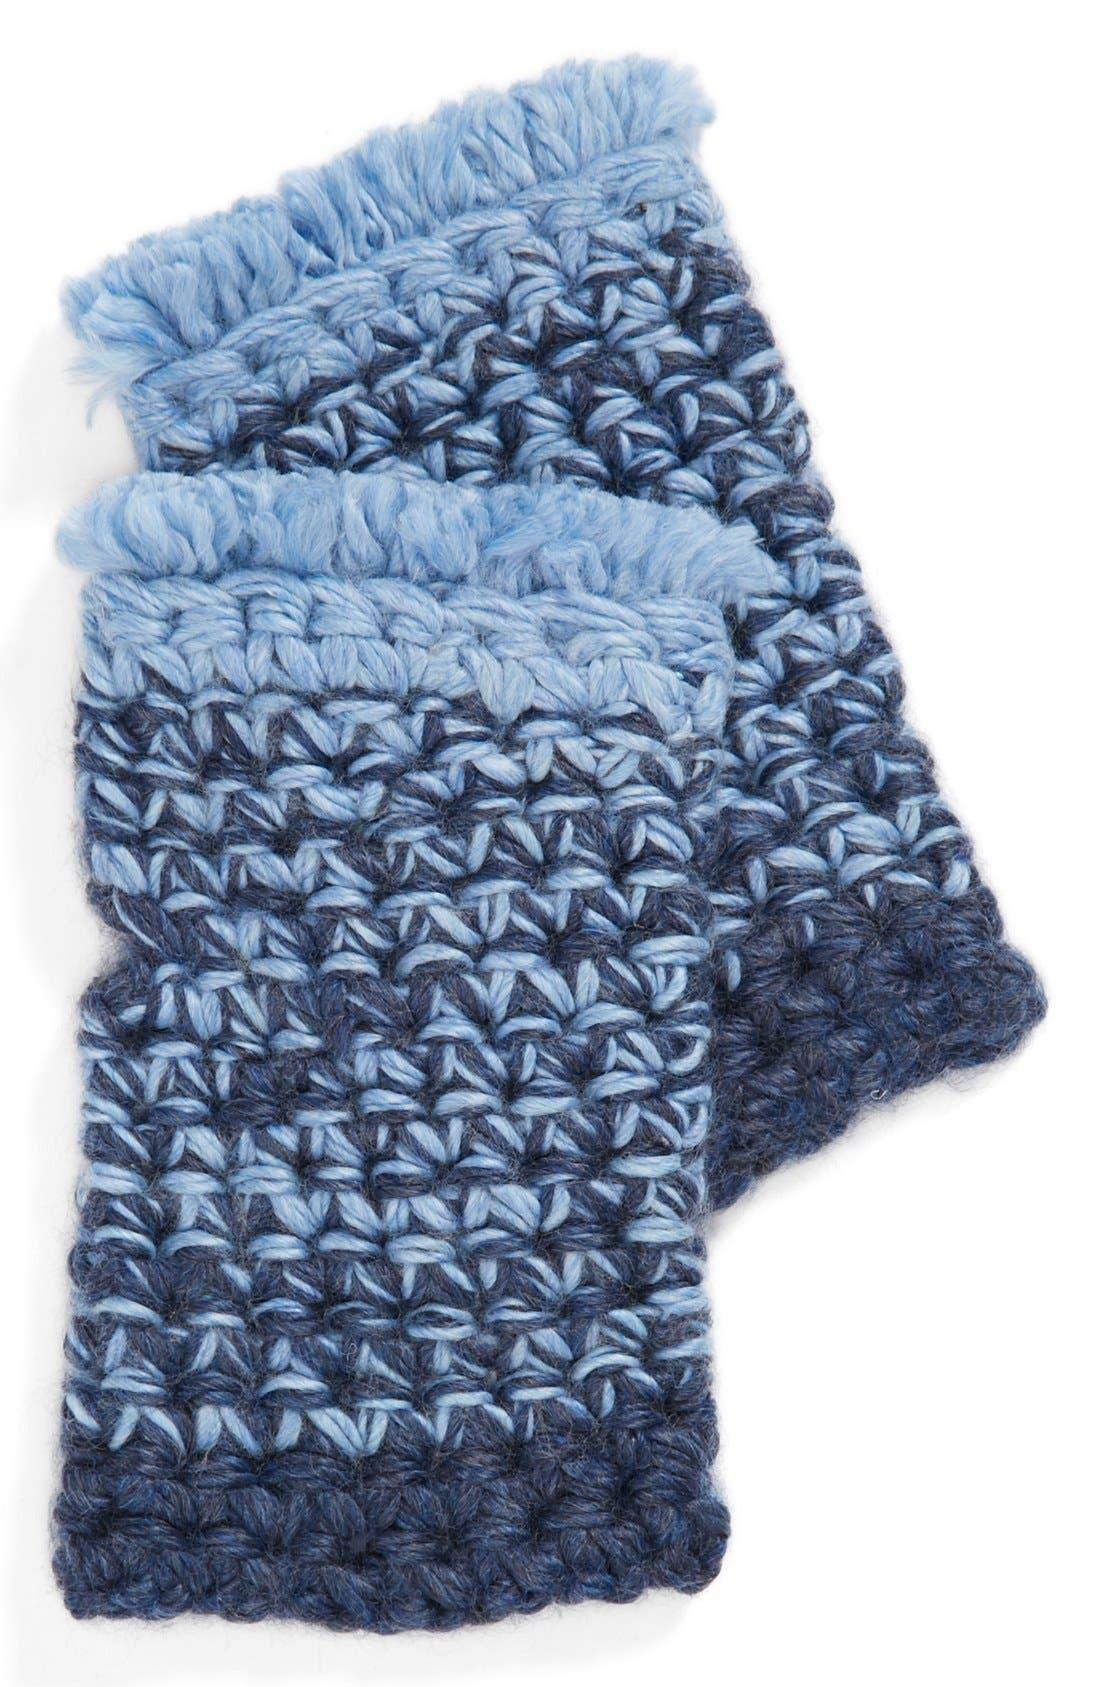 Alternate Image 1 Selected - Echo 'Fringy' Fingerless Gloves